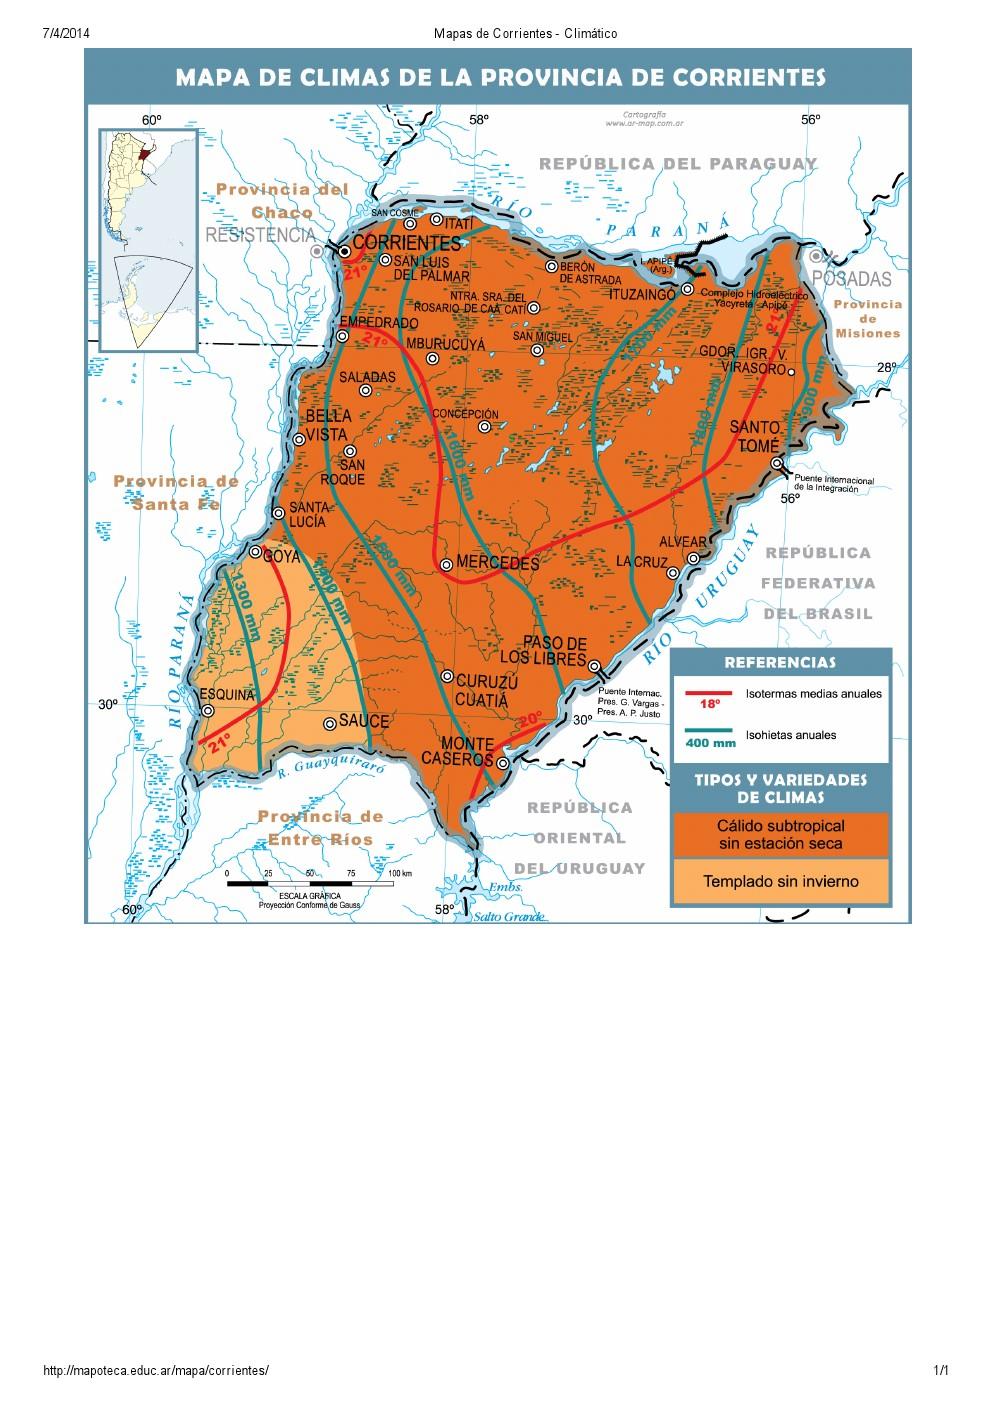 Mapa climático de Corrientes. Mapoteca de Educ.ar